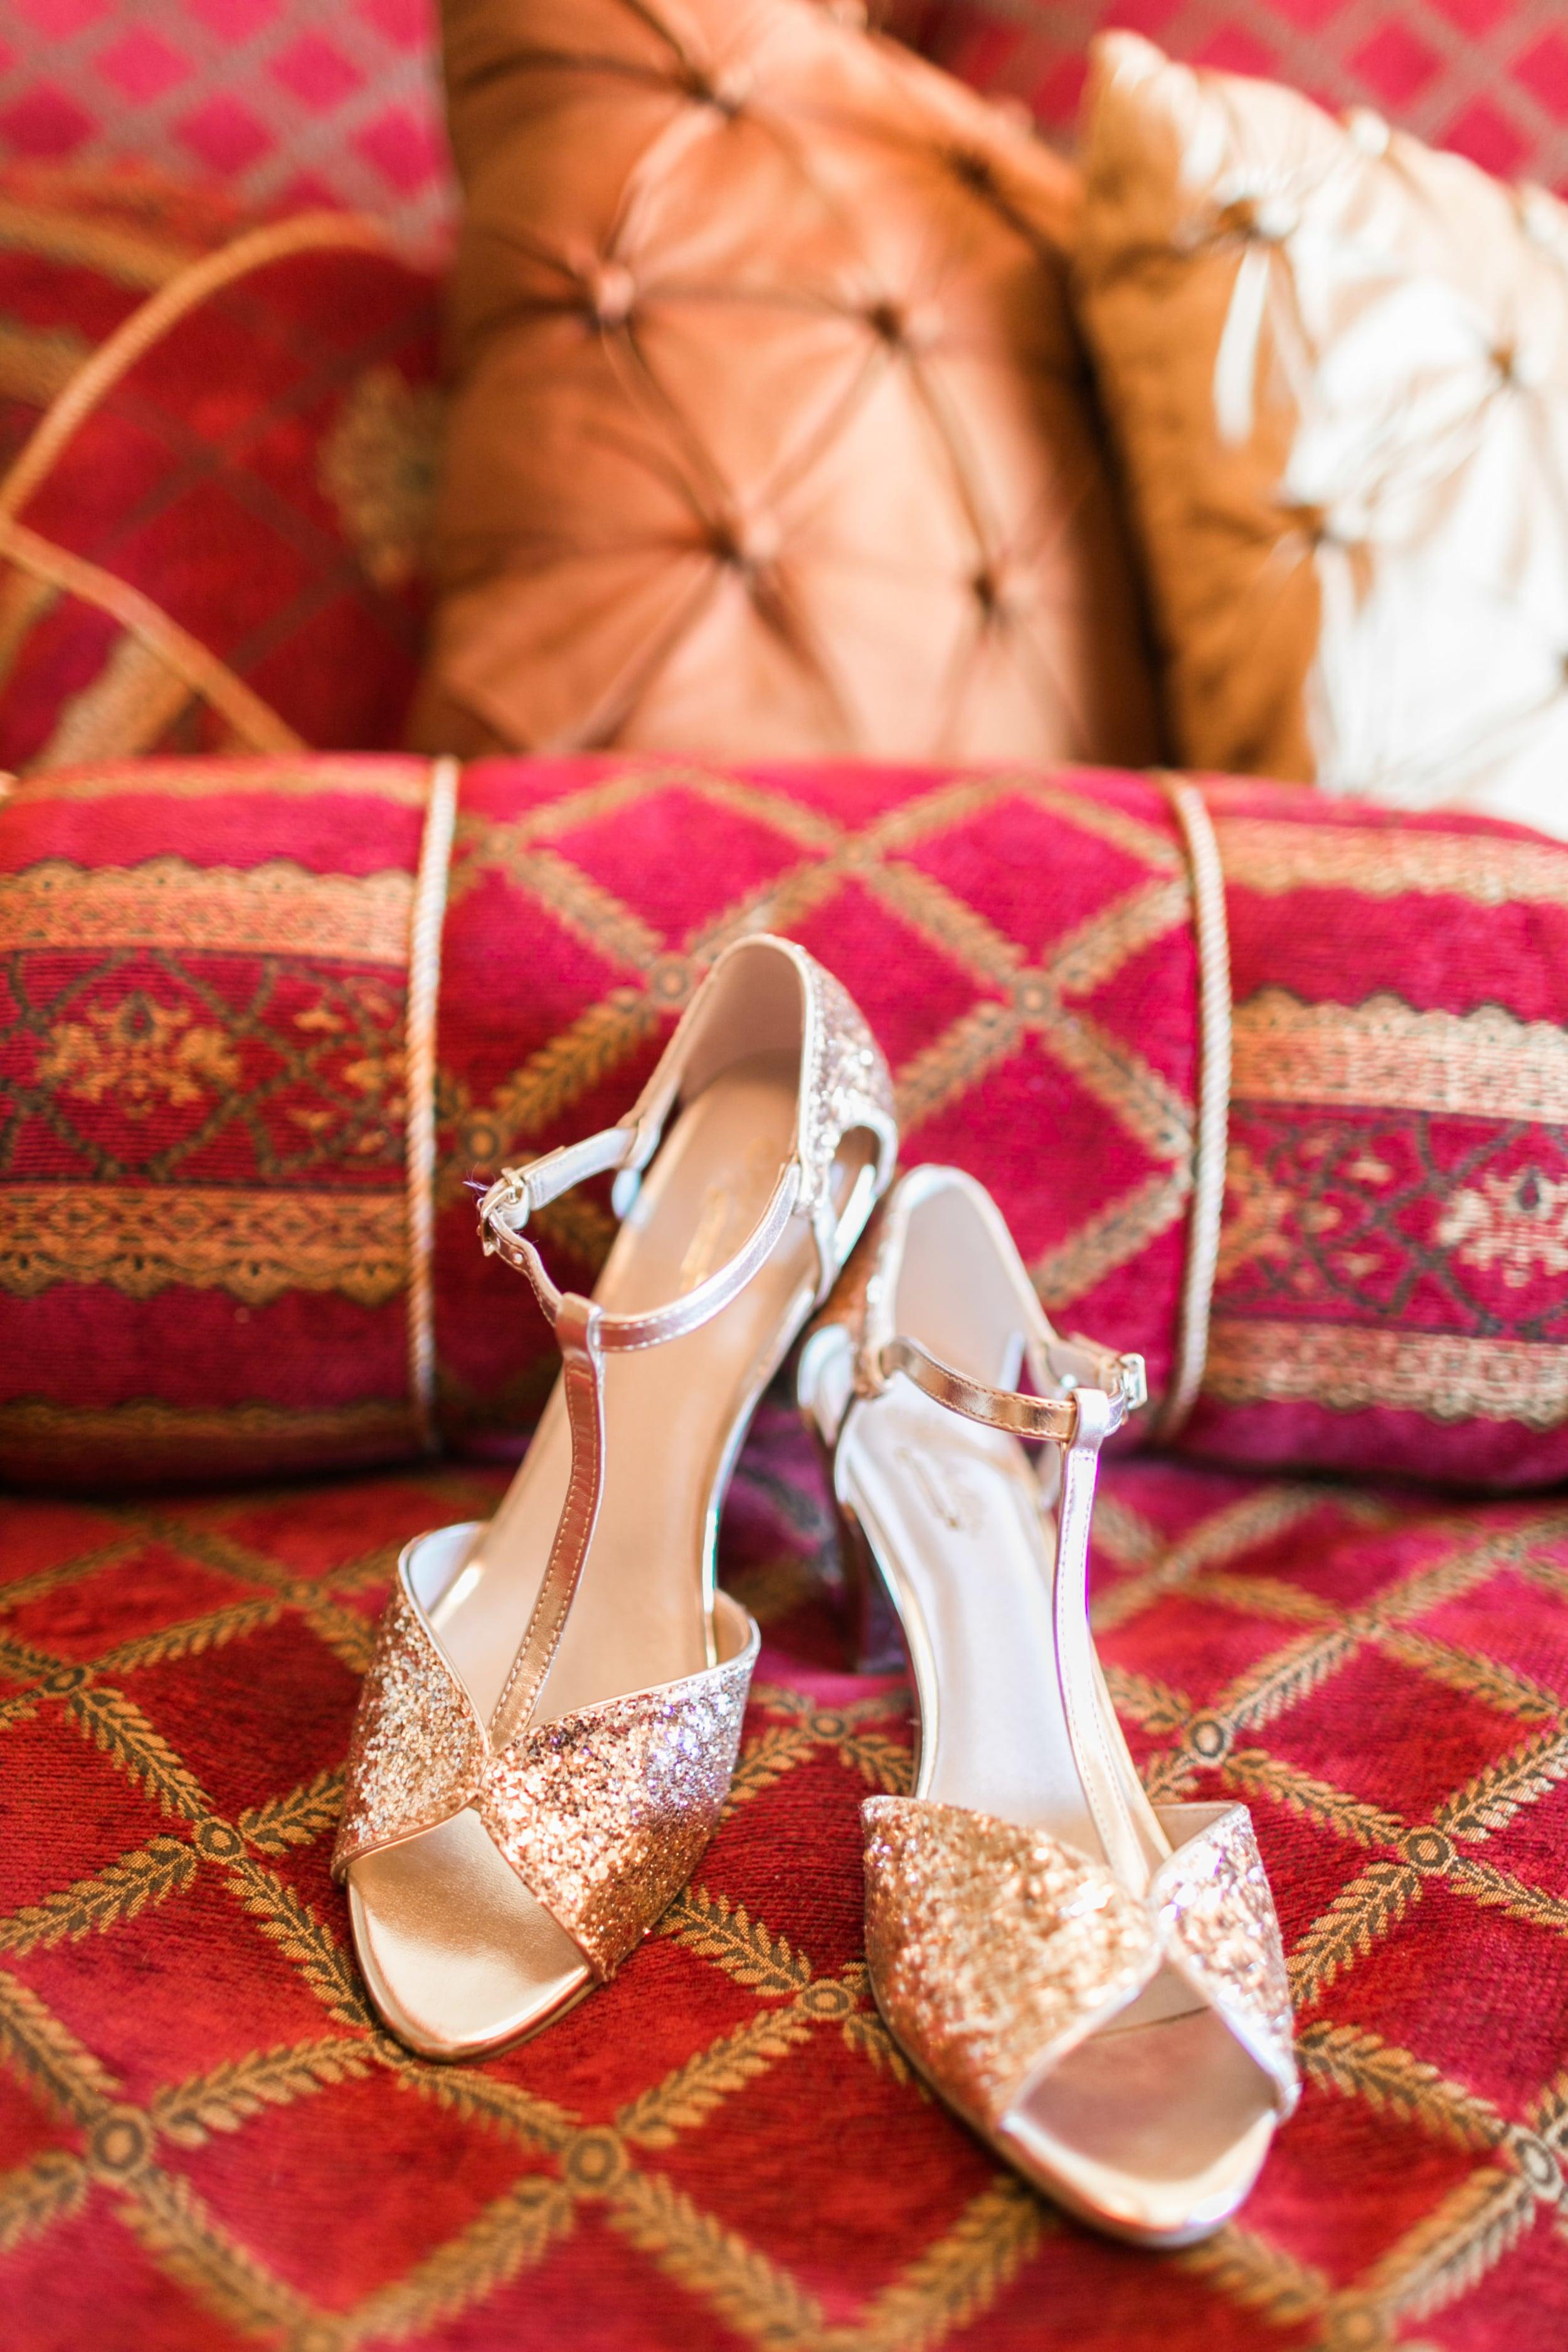 Natalie_Schutt_Photography_Winter_Wedding_San_Luis_Obispo-21.jpg